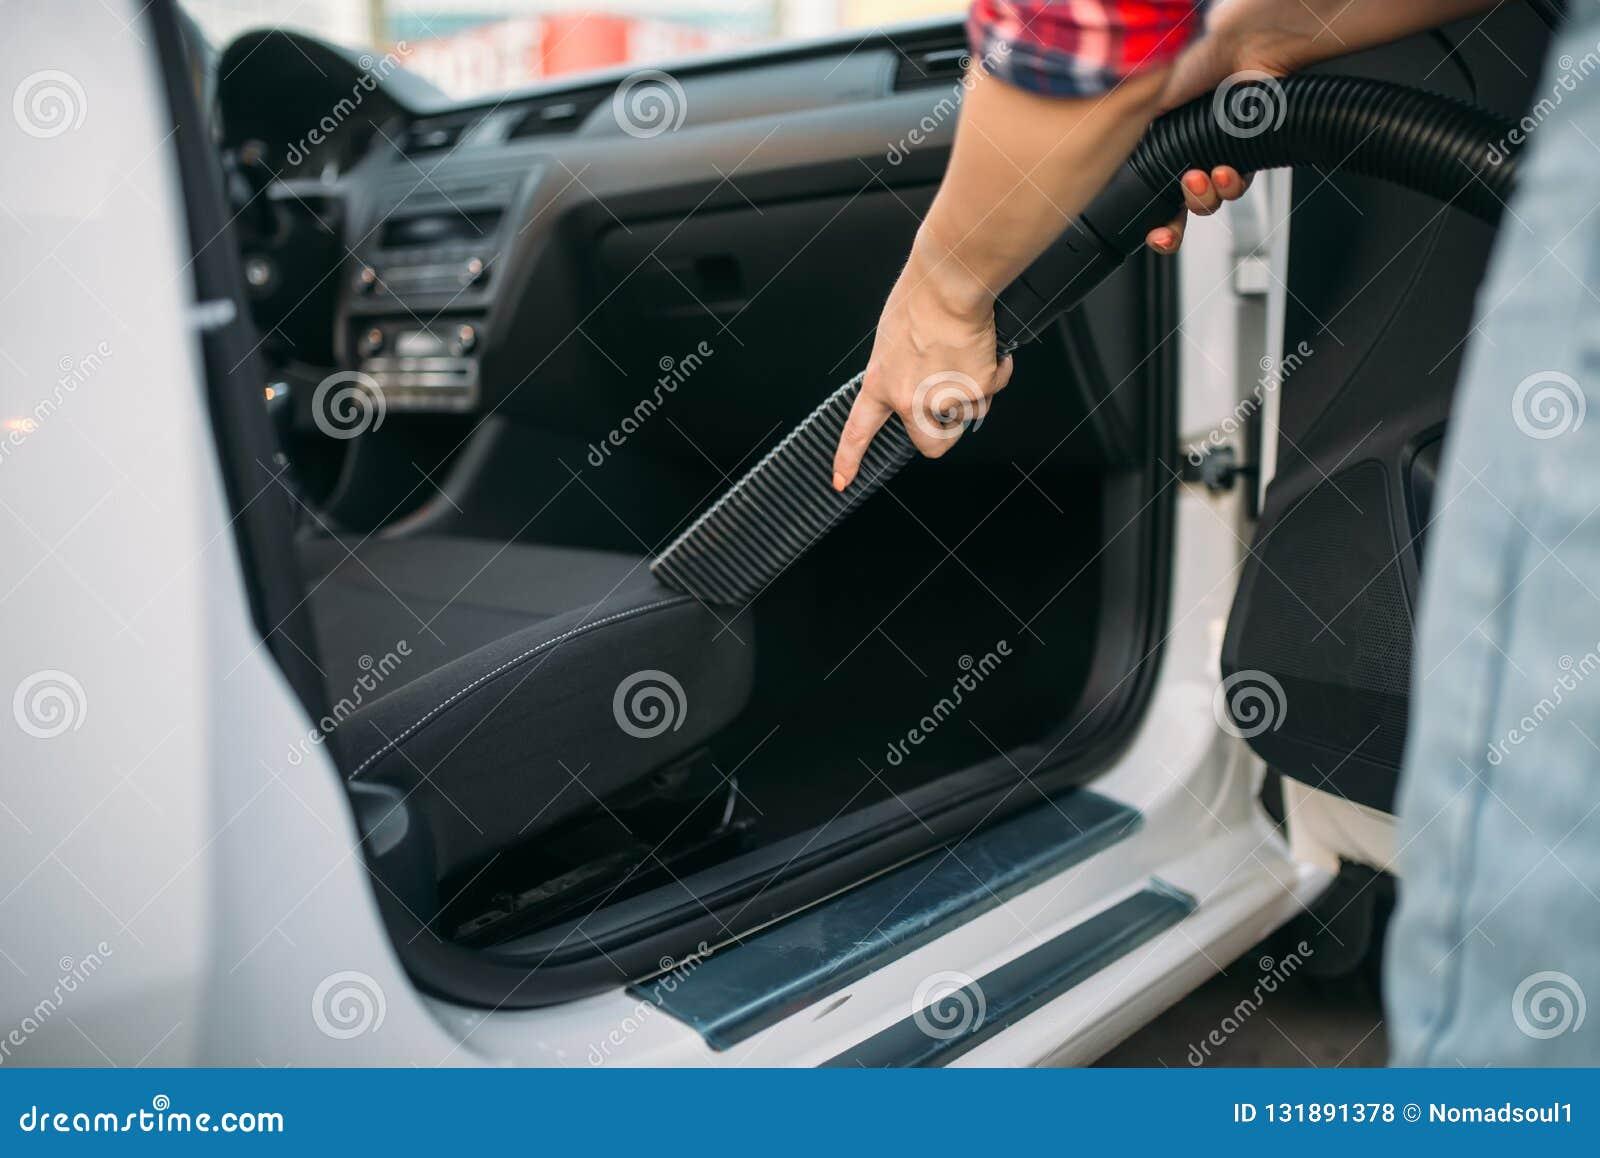 Frau säubert Autoinnenraum mit Staubsauger